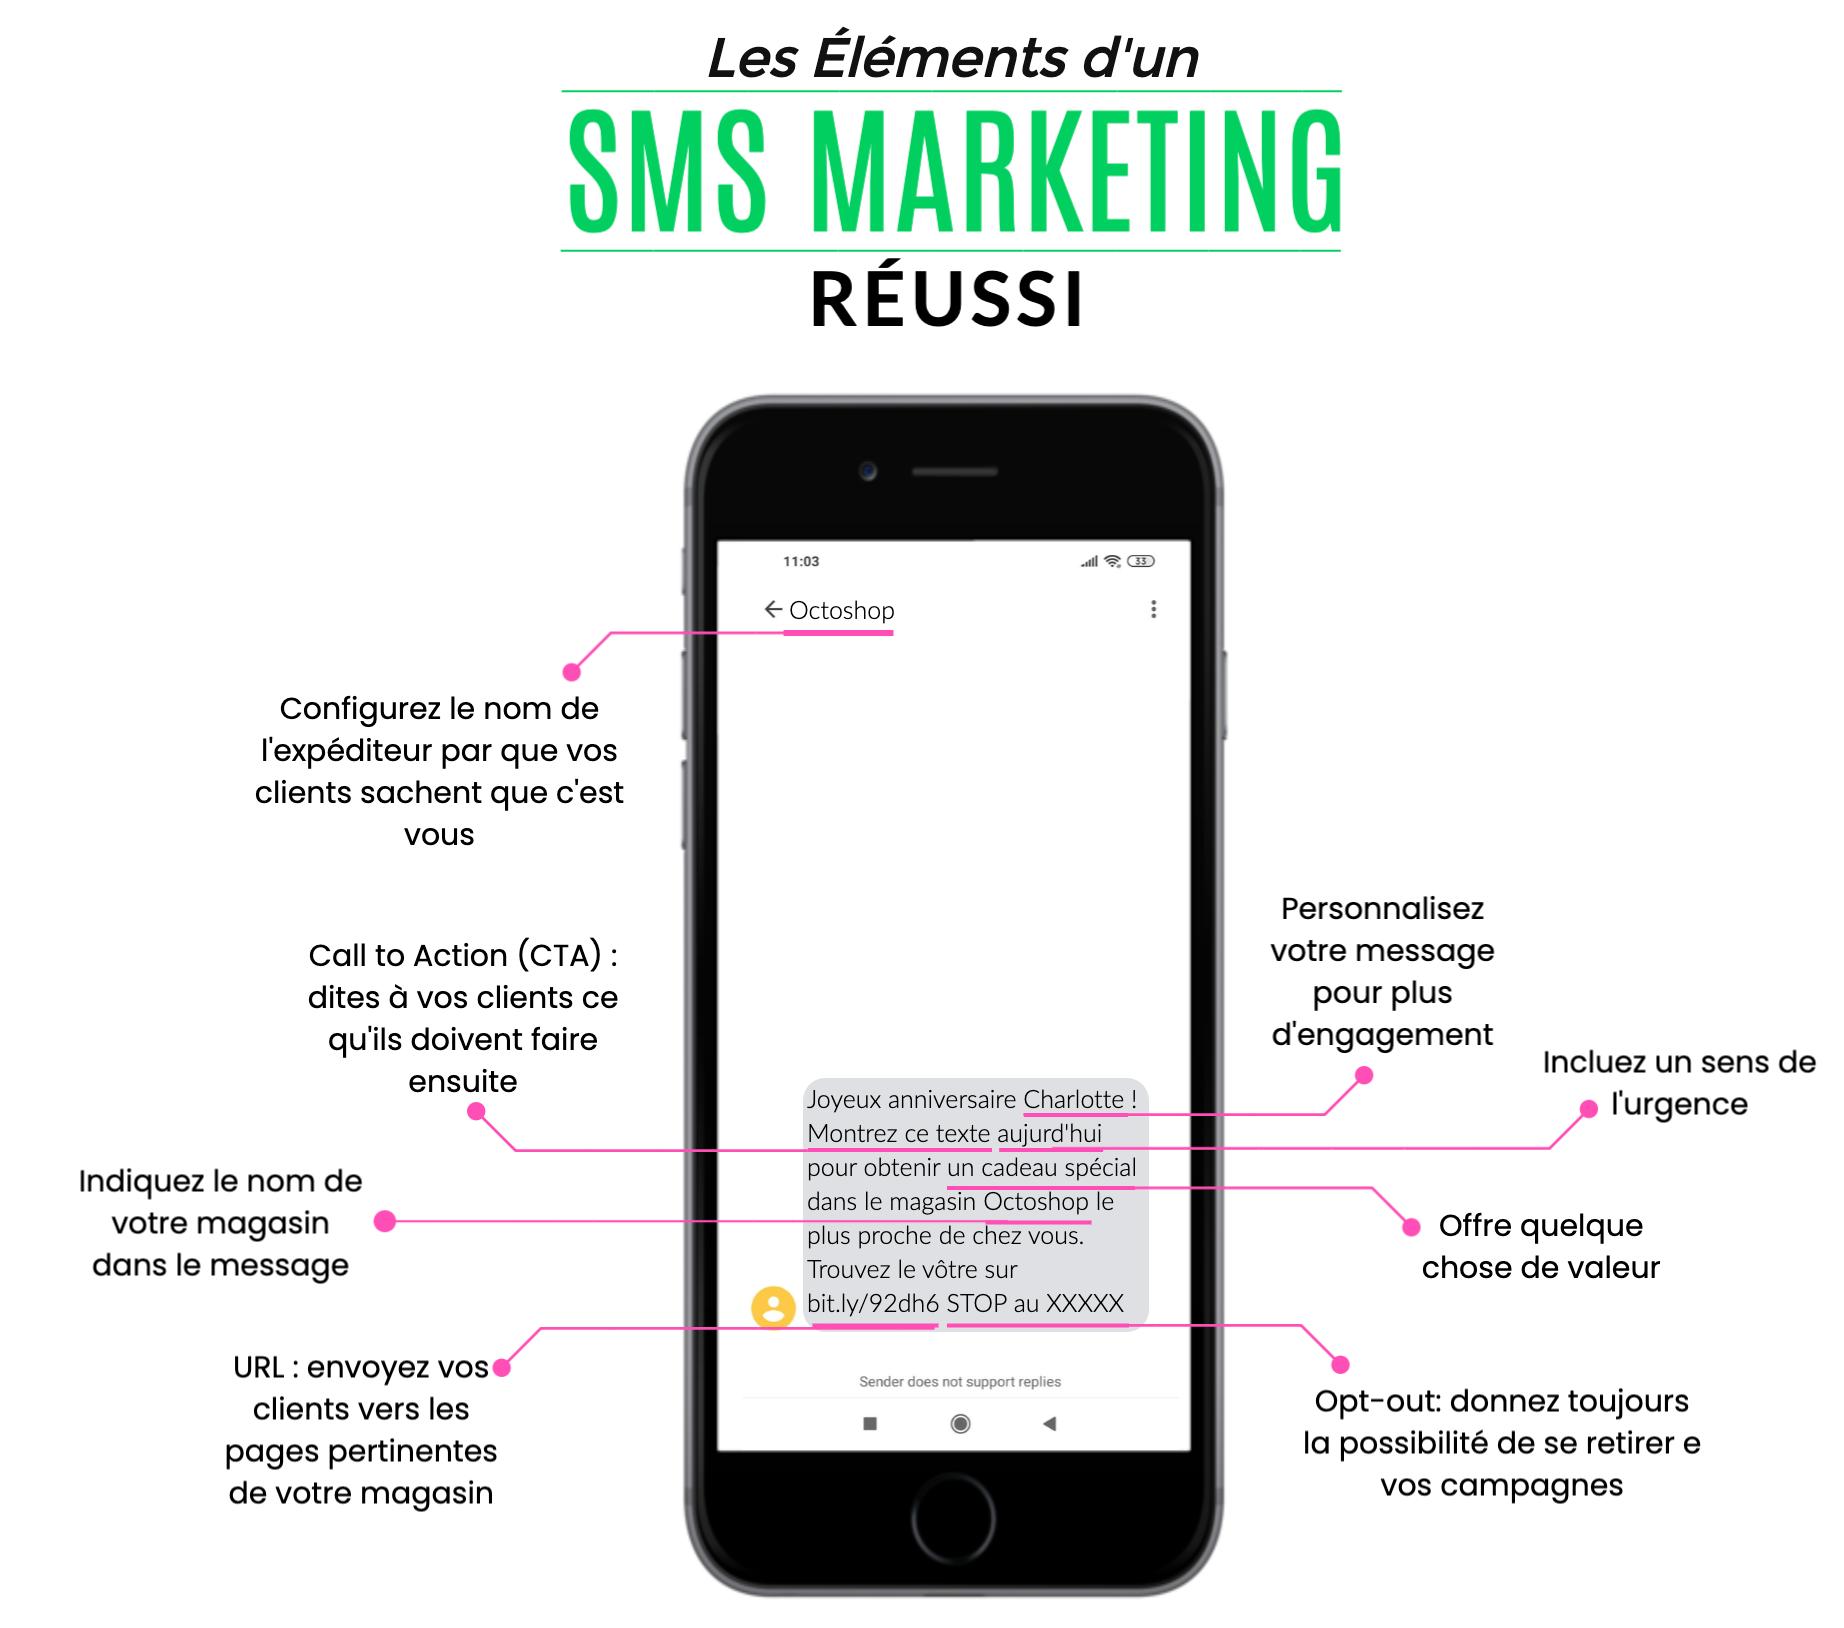 elements sms marketing reussi